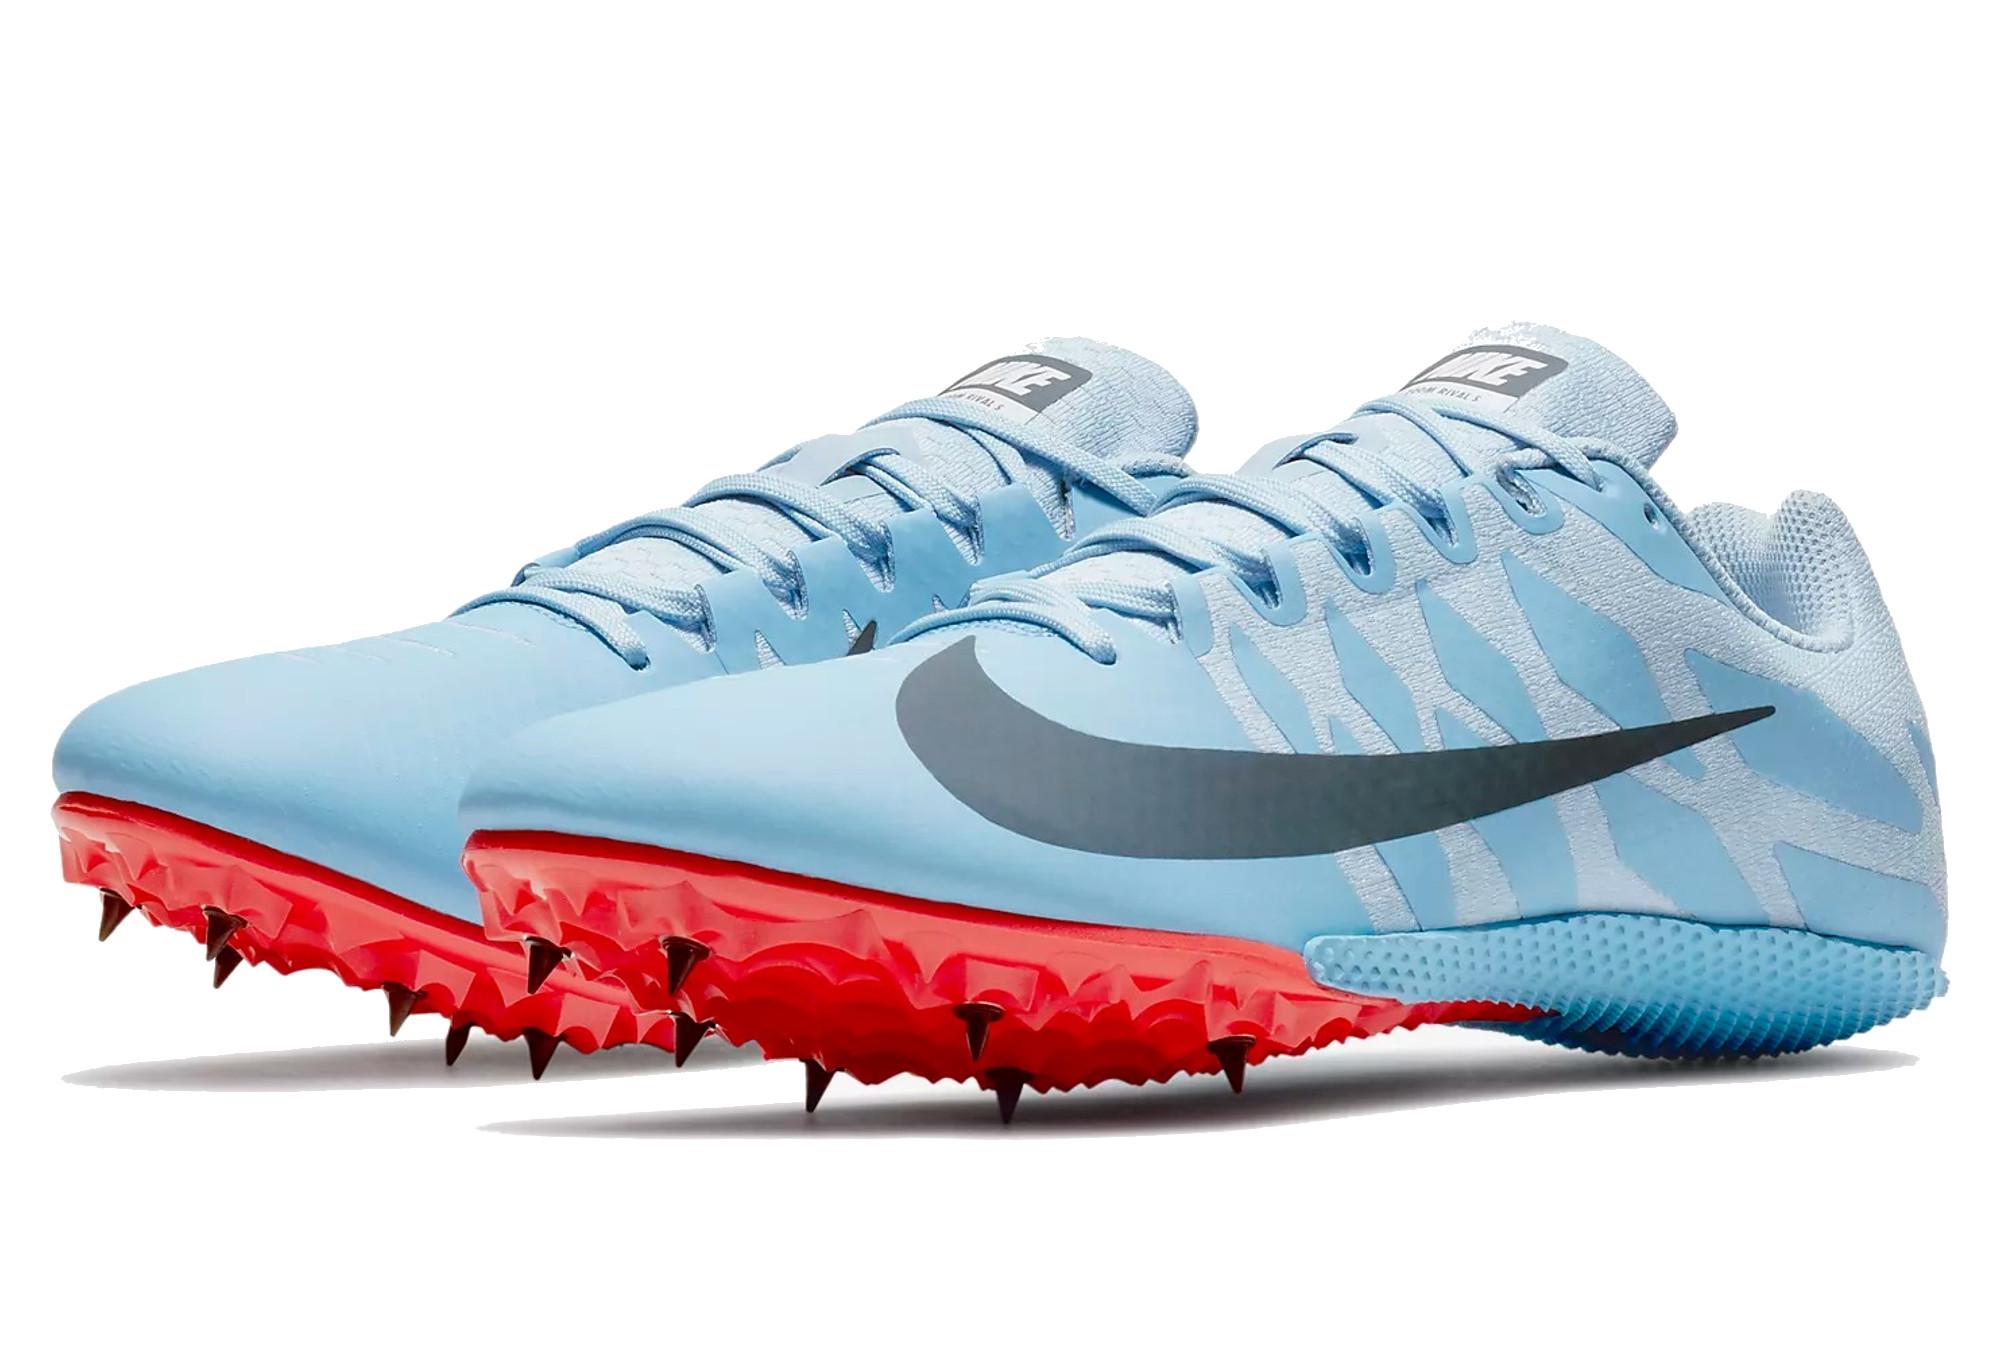 brand new ef07d eed63 Chaussures d Athlétisme Nike Zoom Rival S 9 Bleu   Orange